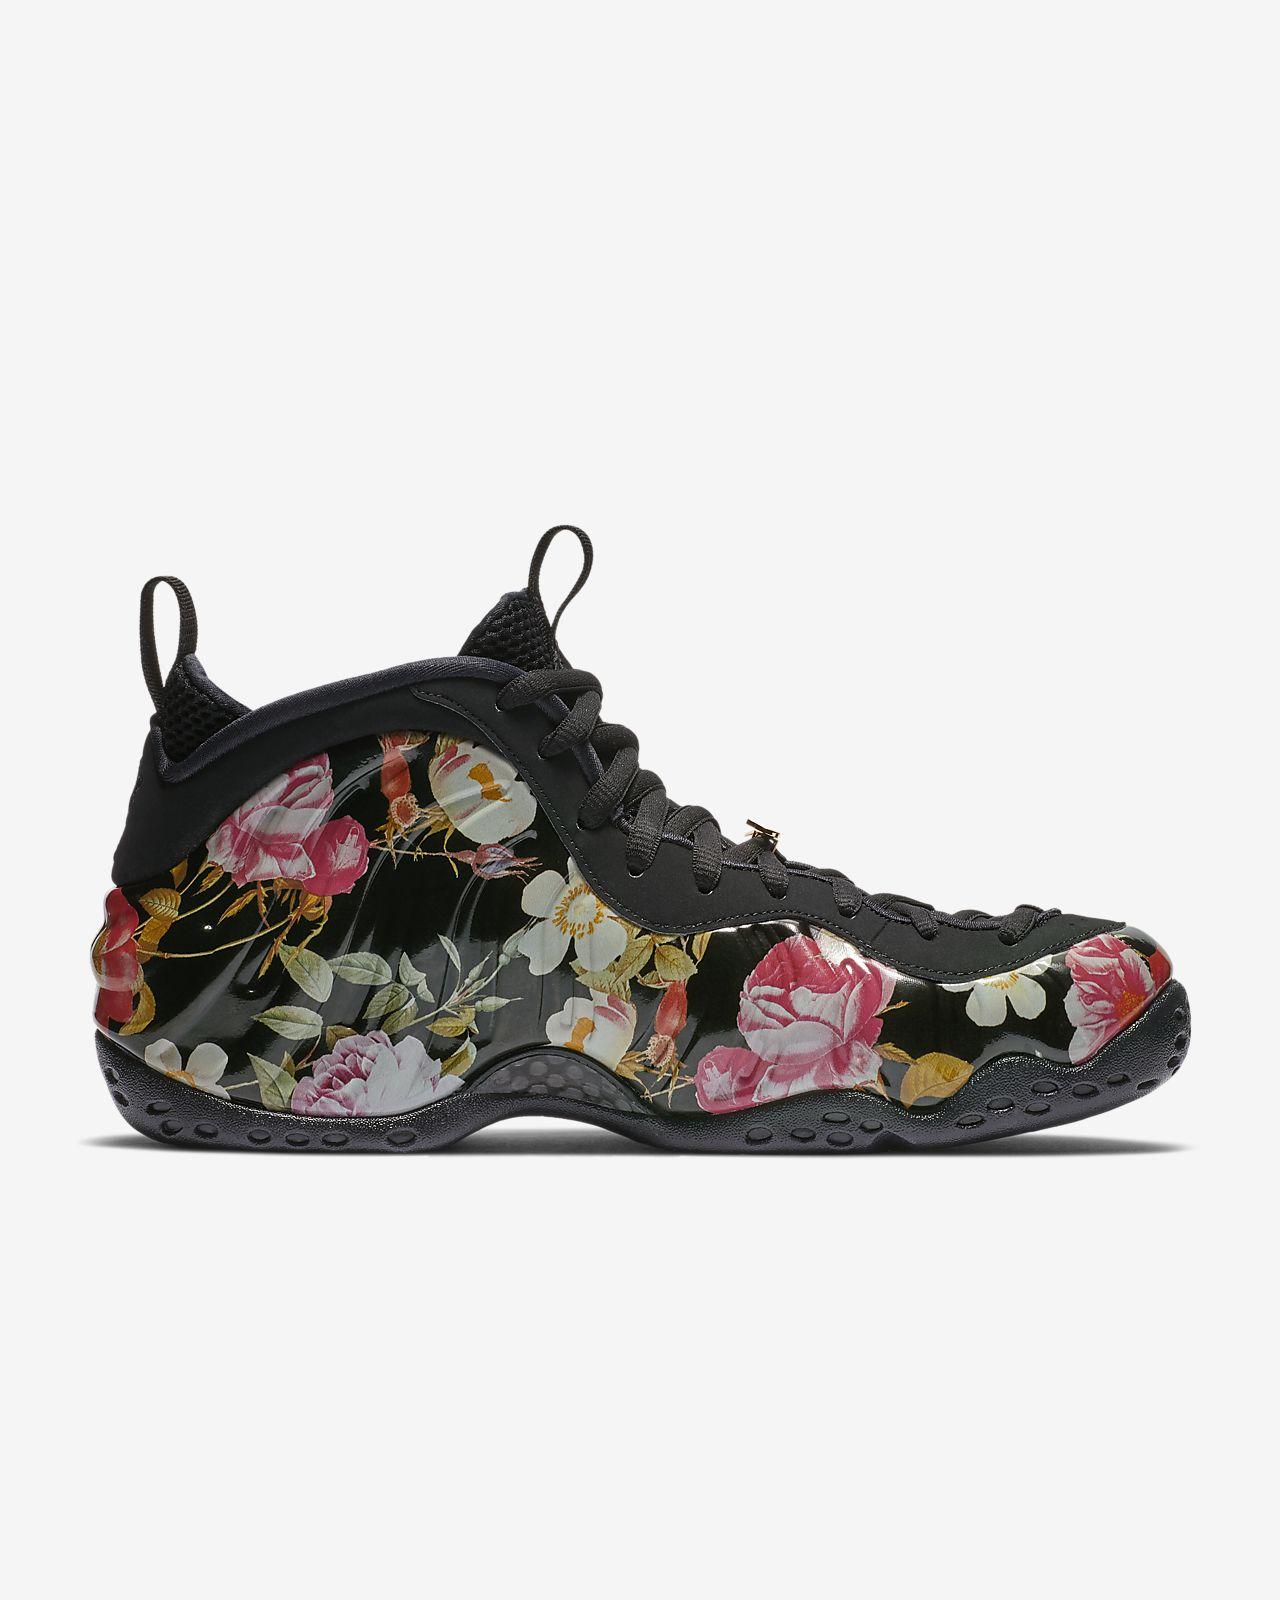 cheaper 0a167 bc4f5 ... Nike Air Foamposite One Men s Shoe